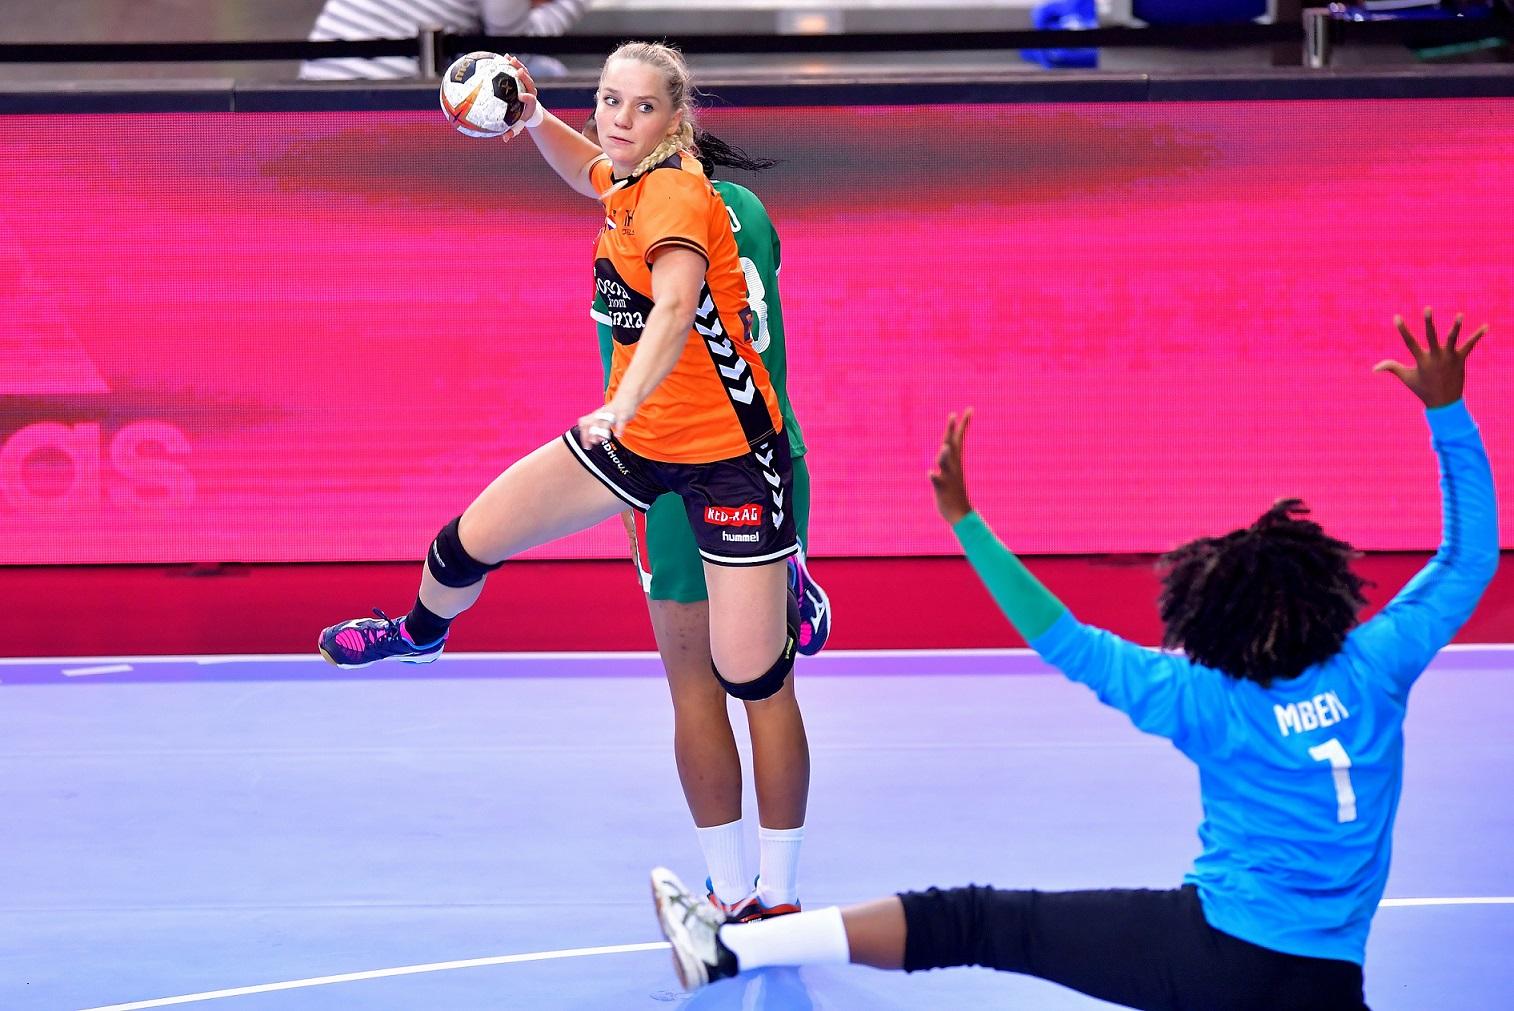 5-12-2017 HANDBAL:NEDERLAND-KAMEROEN:LEIPZIG WK Handbal Dames 2017 Nederland - Kameroen 29-22 Angela Steenbakkers #4 NED  Foto: Henk Seppen